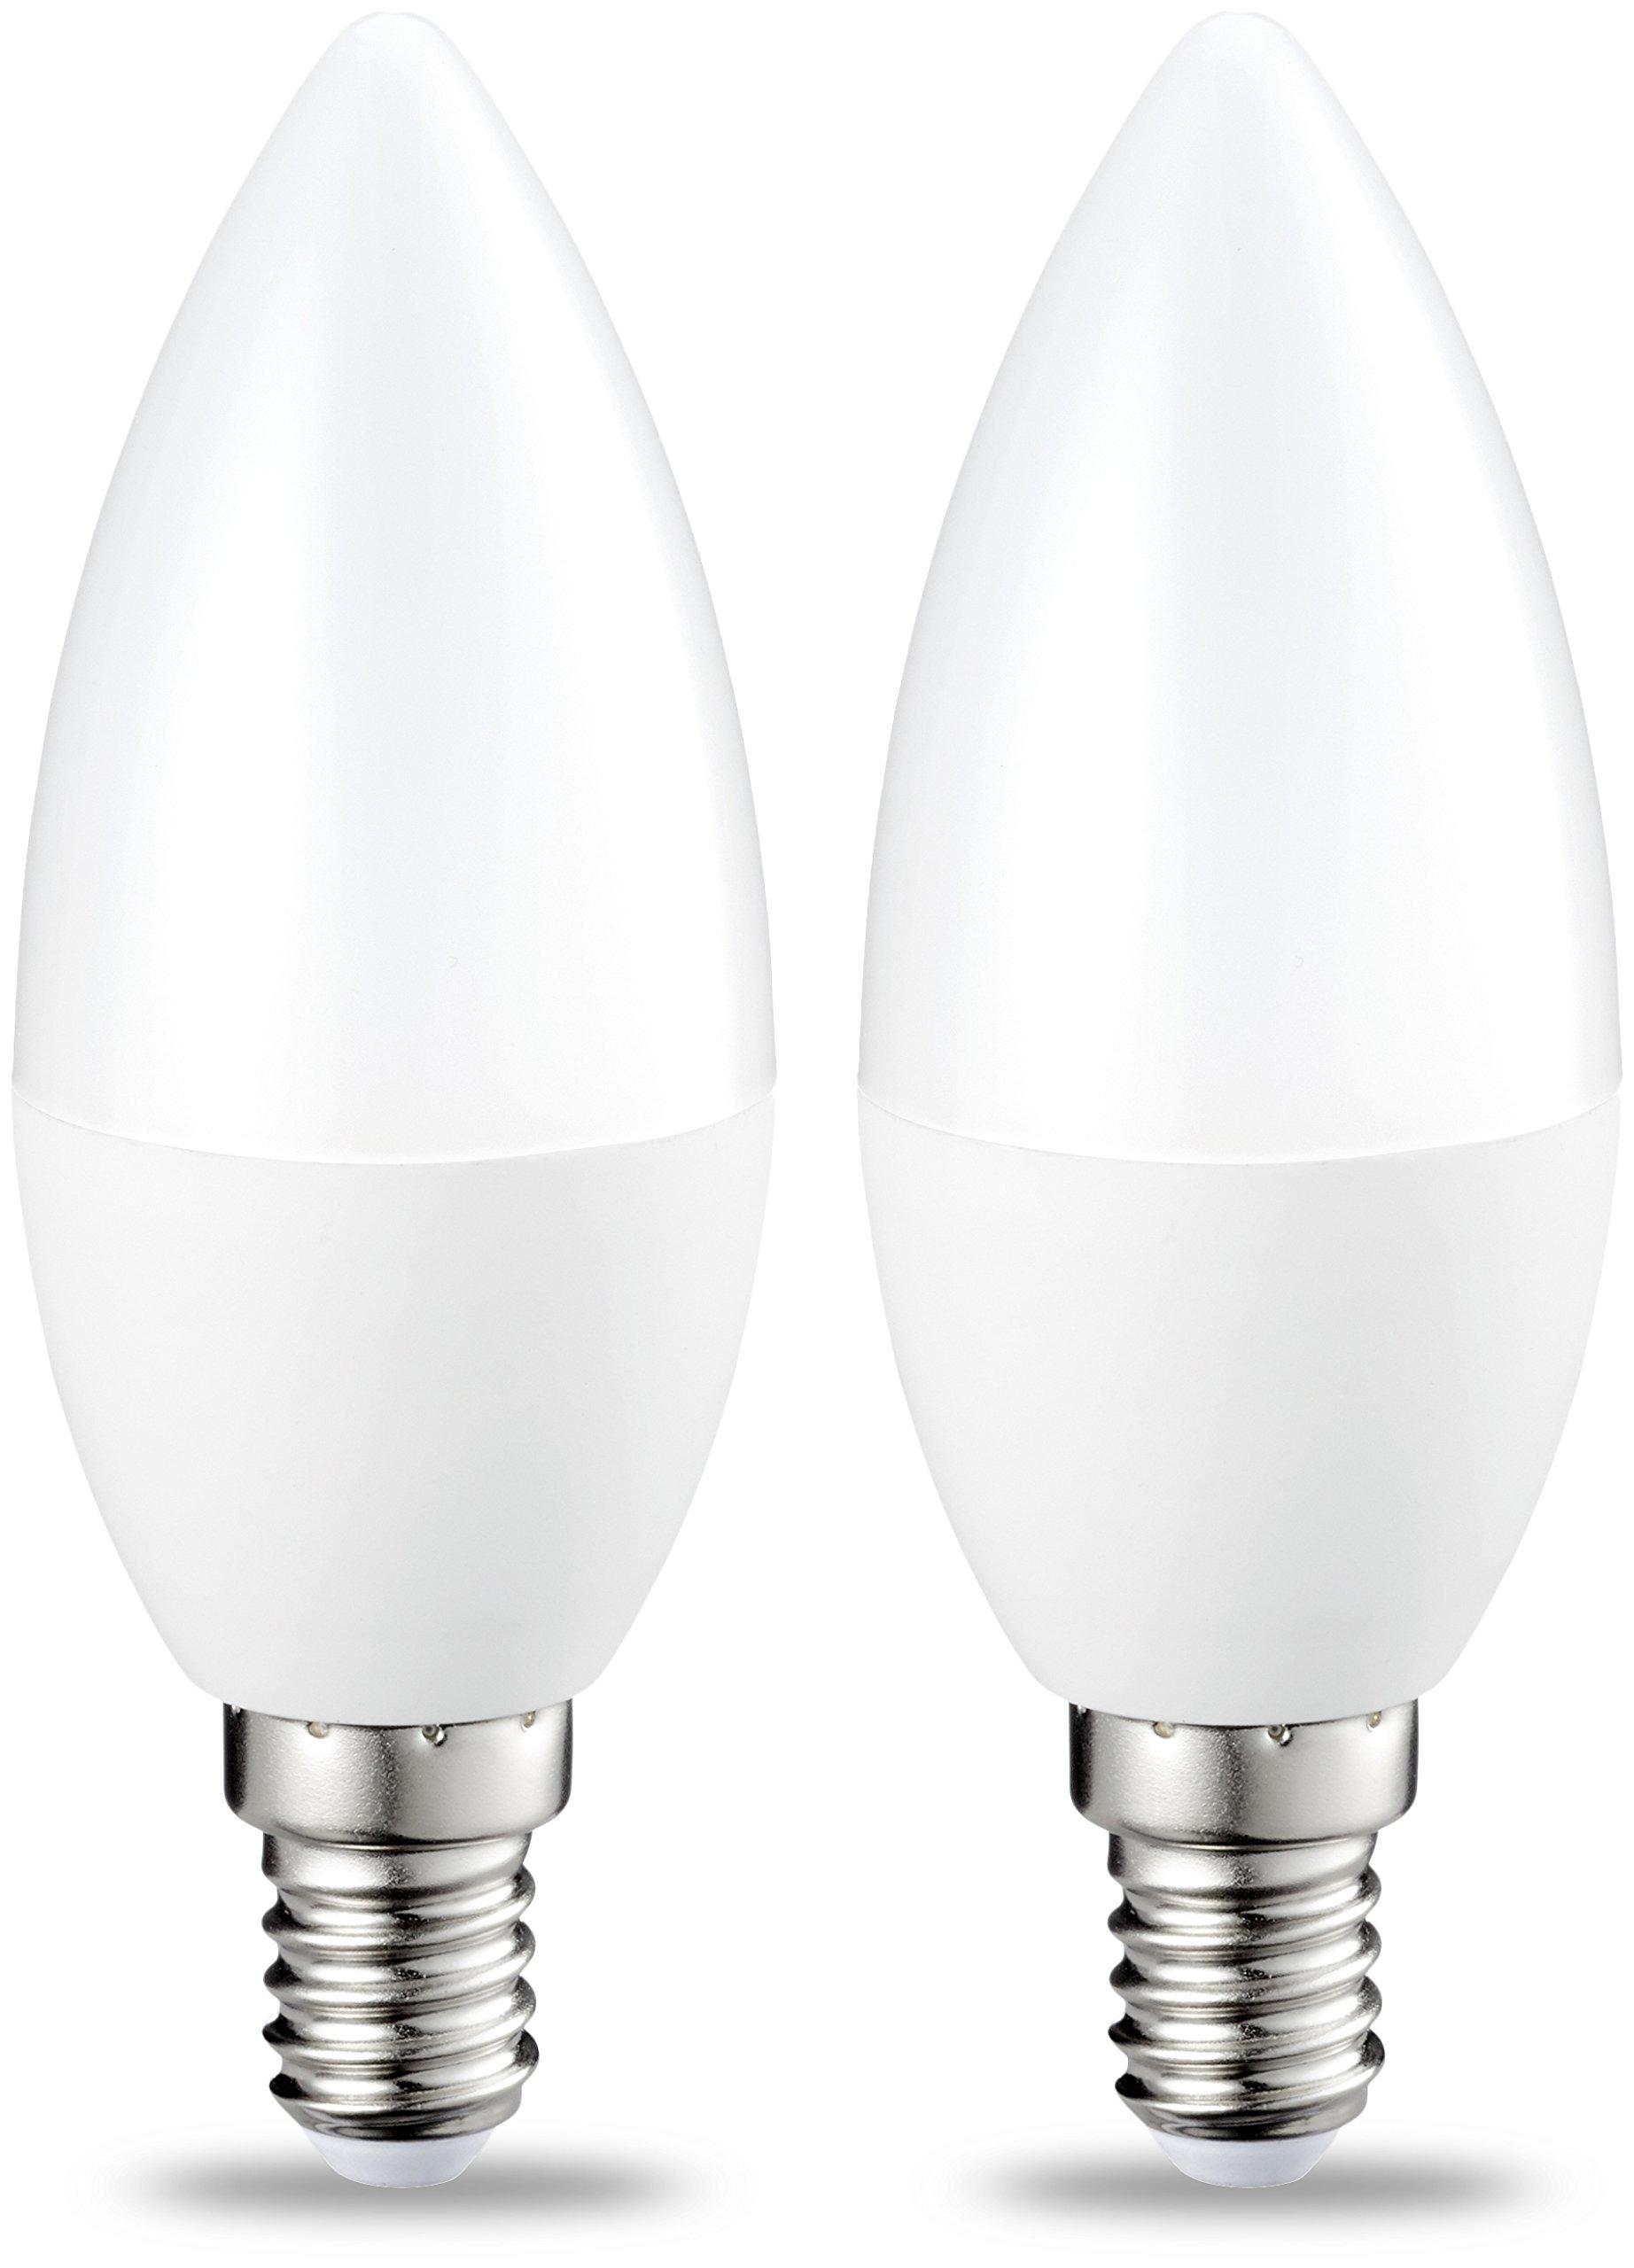 amazonbasics led e14 small edison screw candle bulb 5 5w equivalent to 40w shop24ore. Black Bedroom Furniture Sets. Home Design Ideas